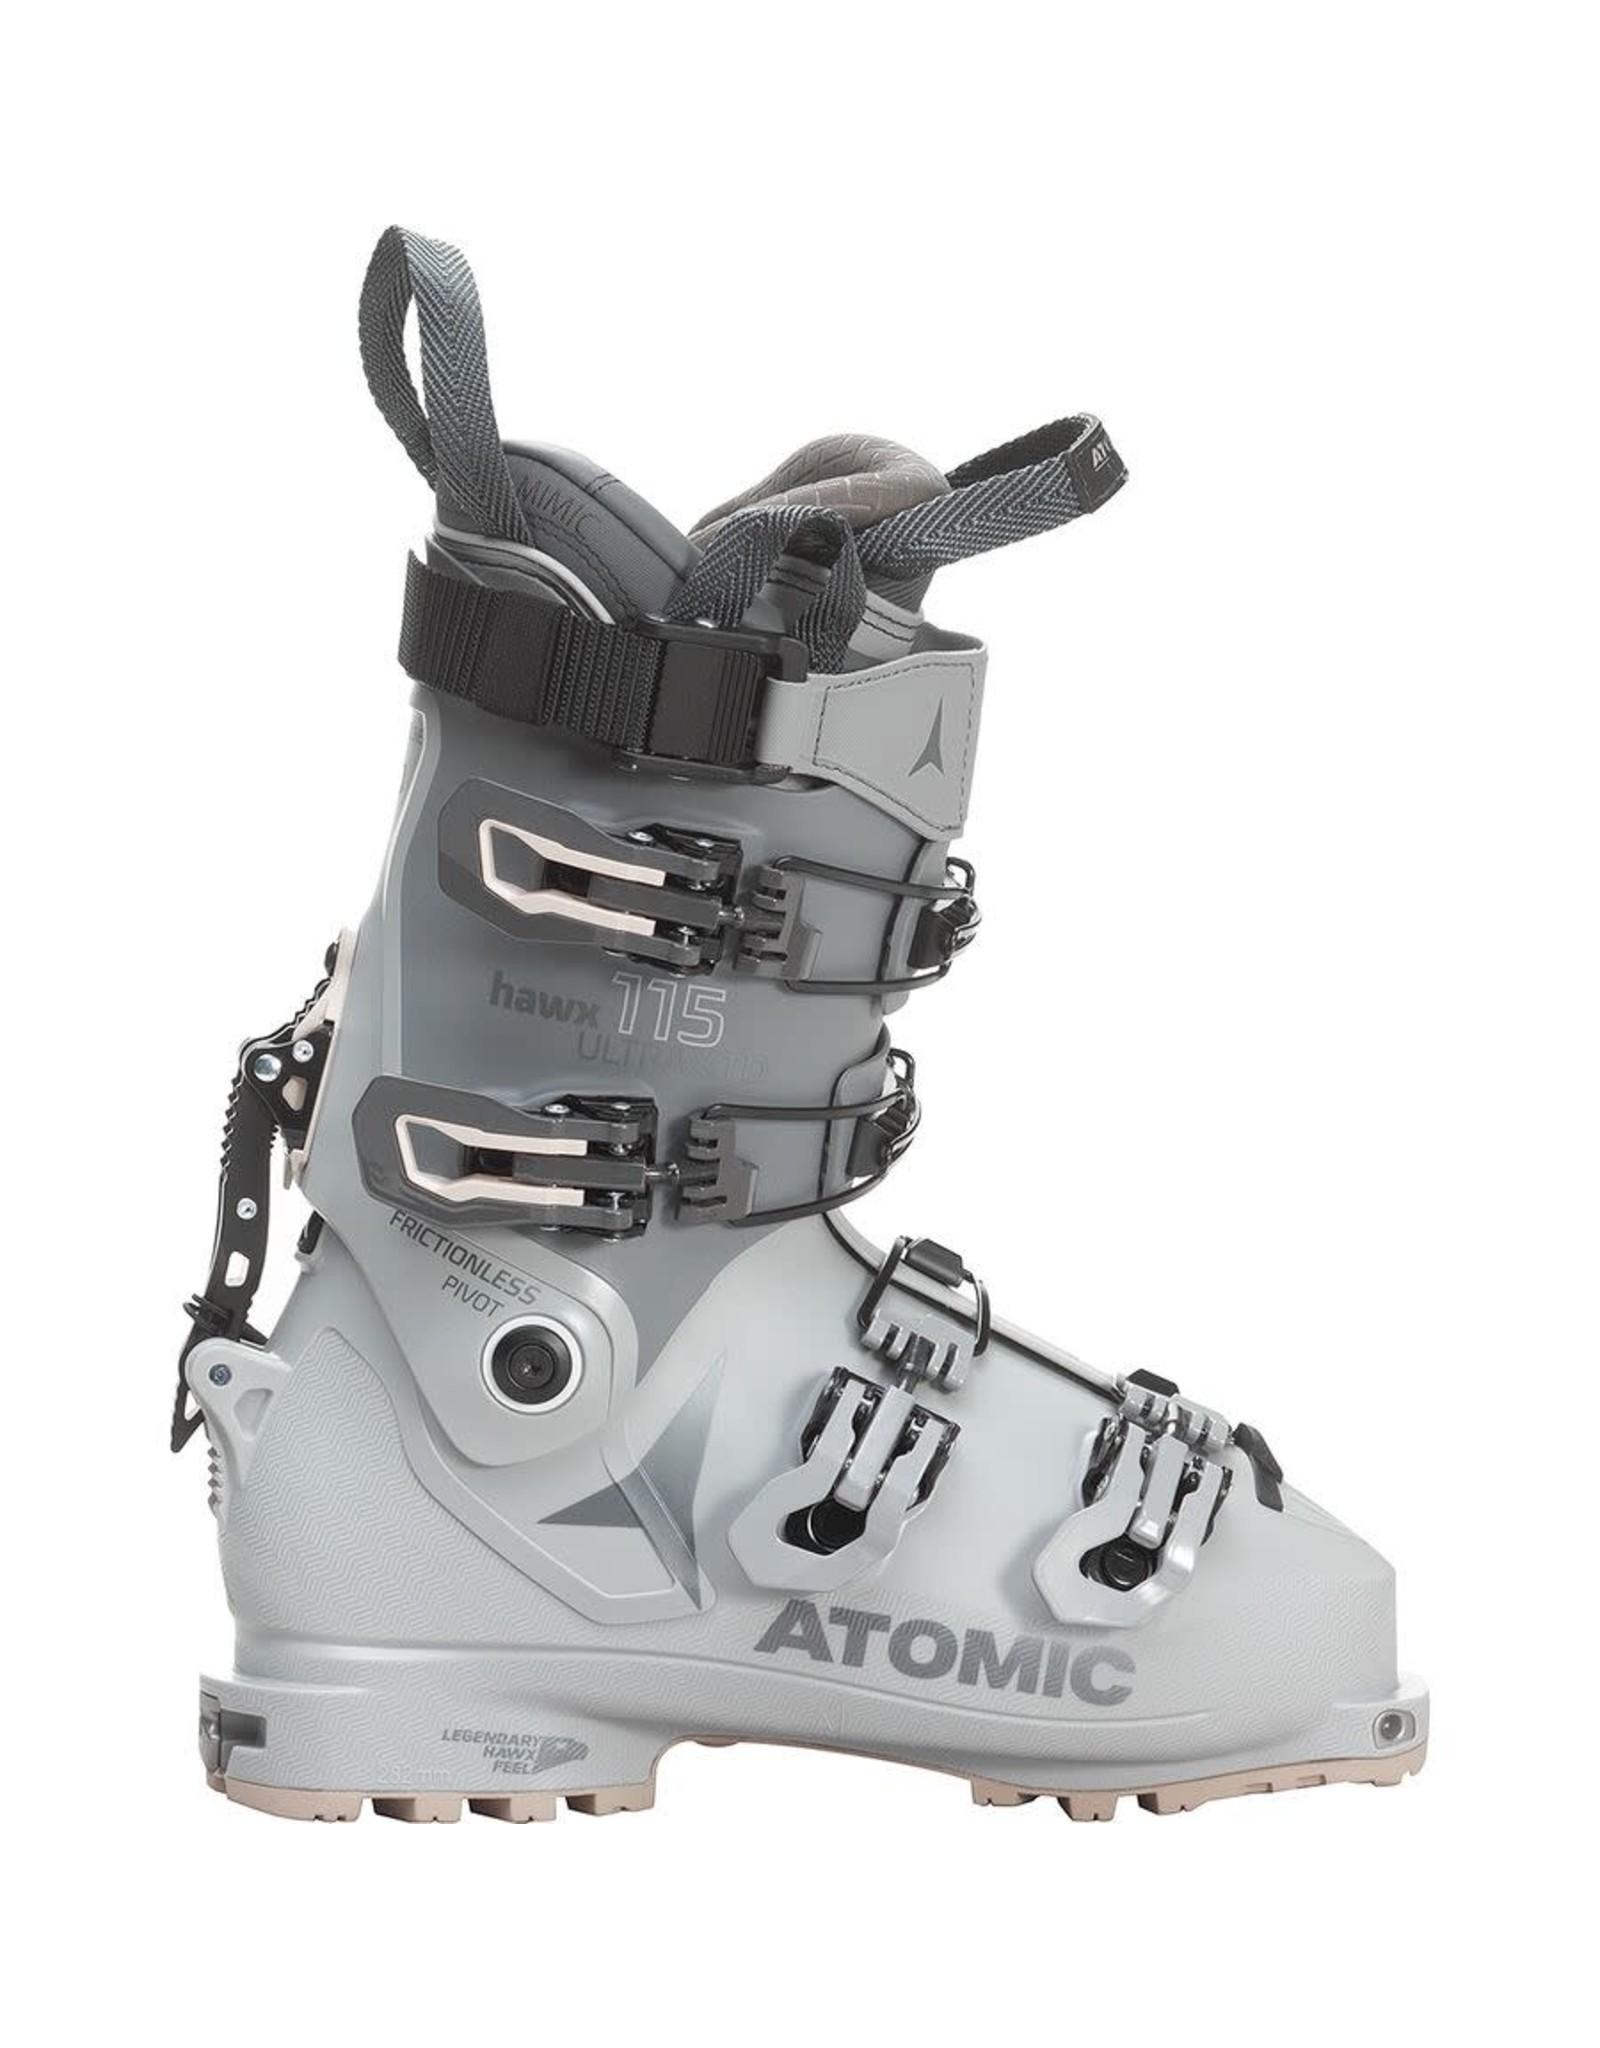 Atomic Atomic Hawx Ultra XTD 115